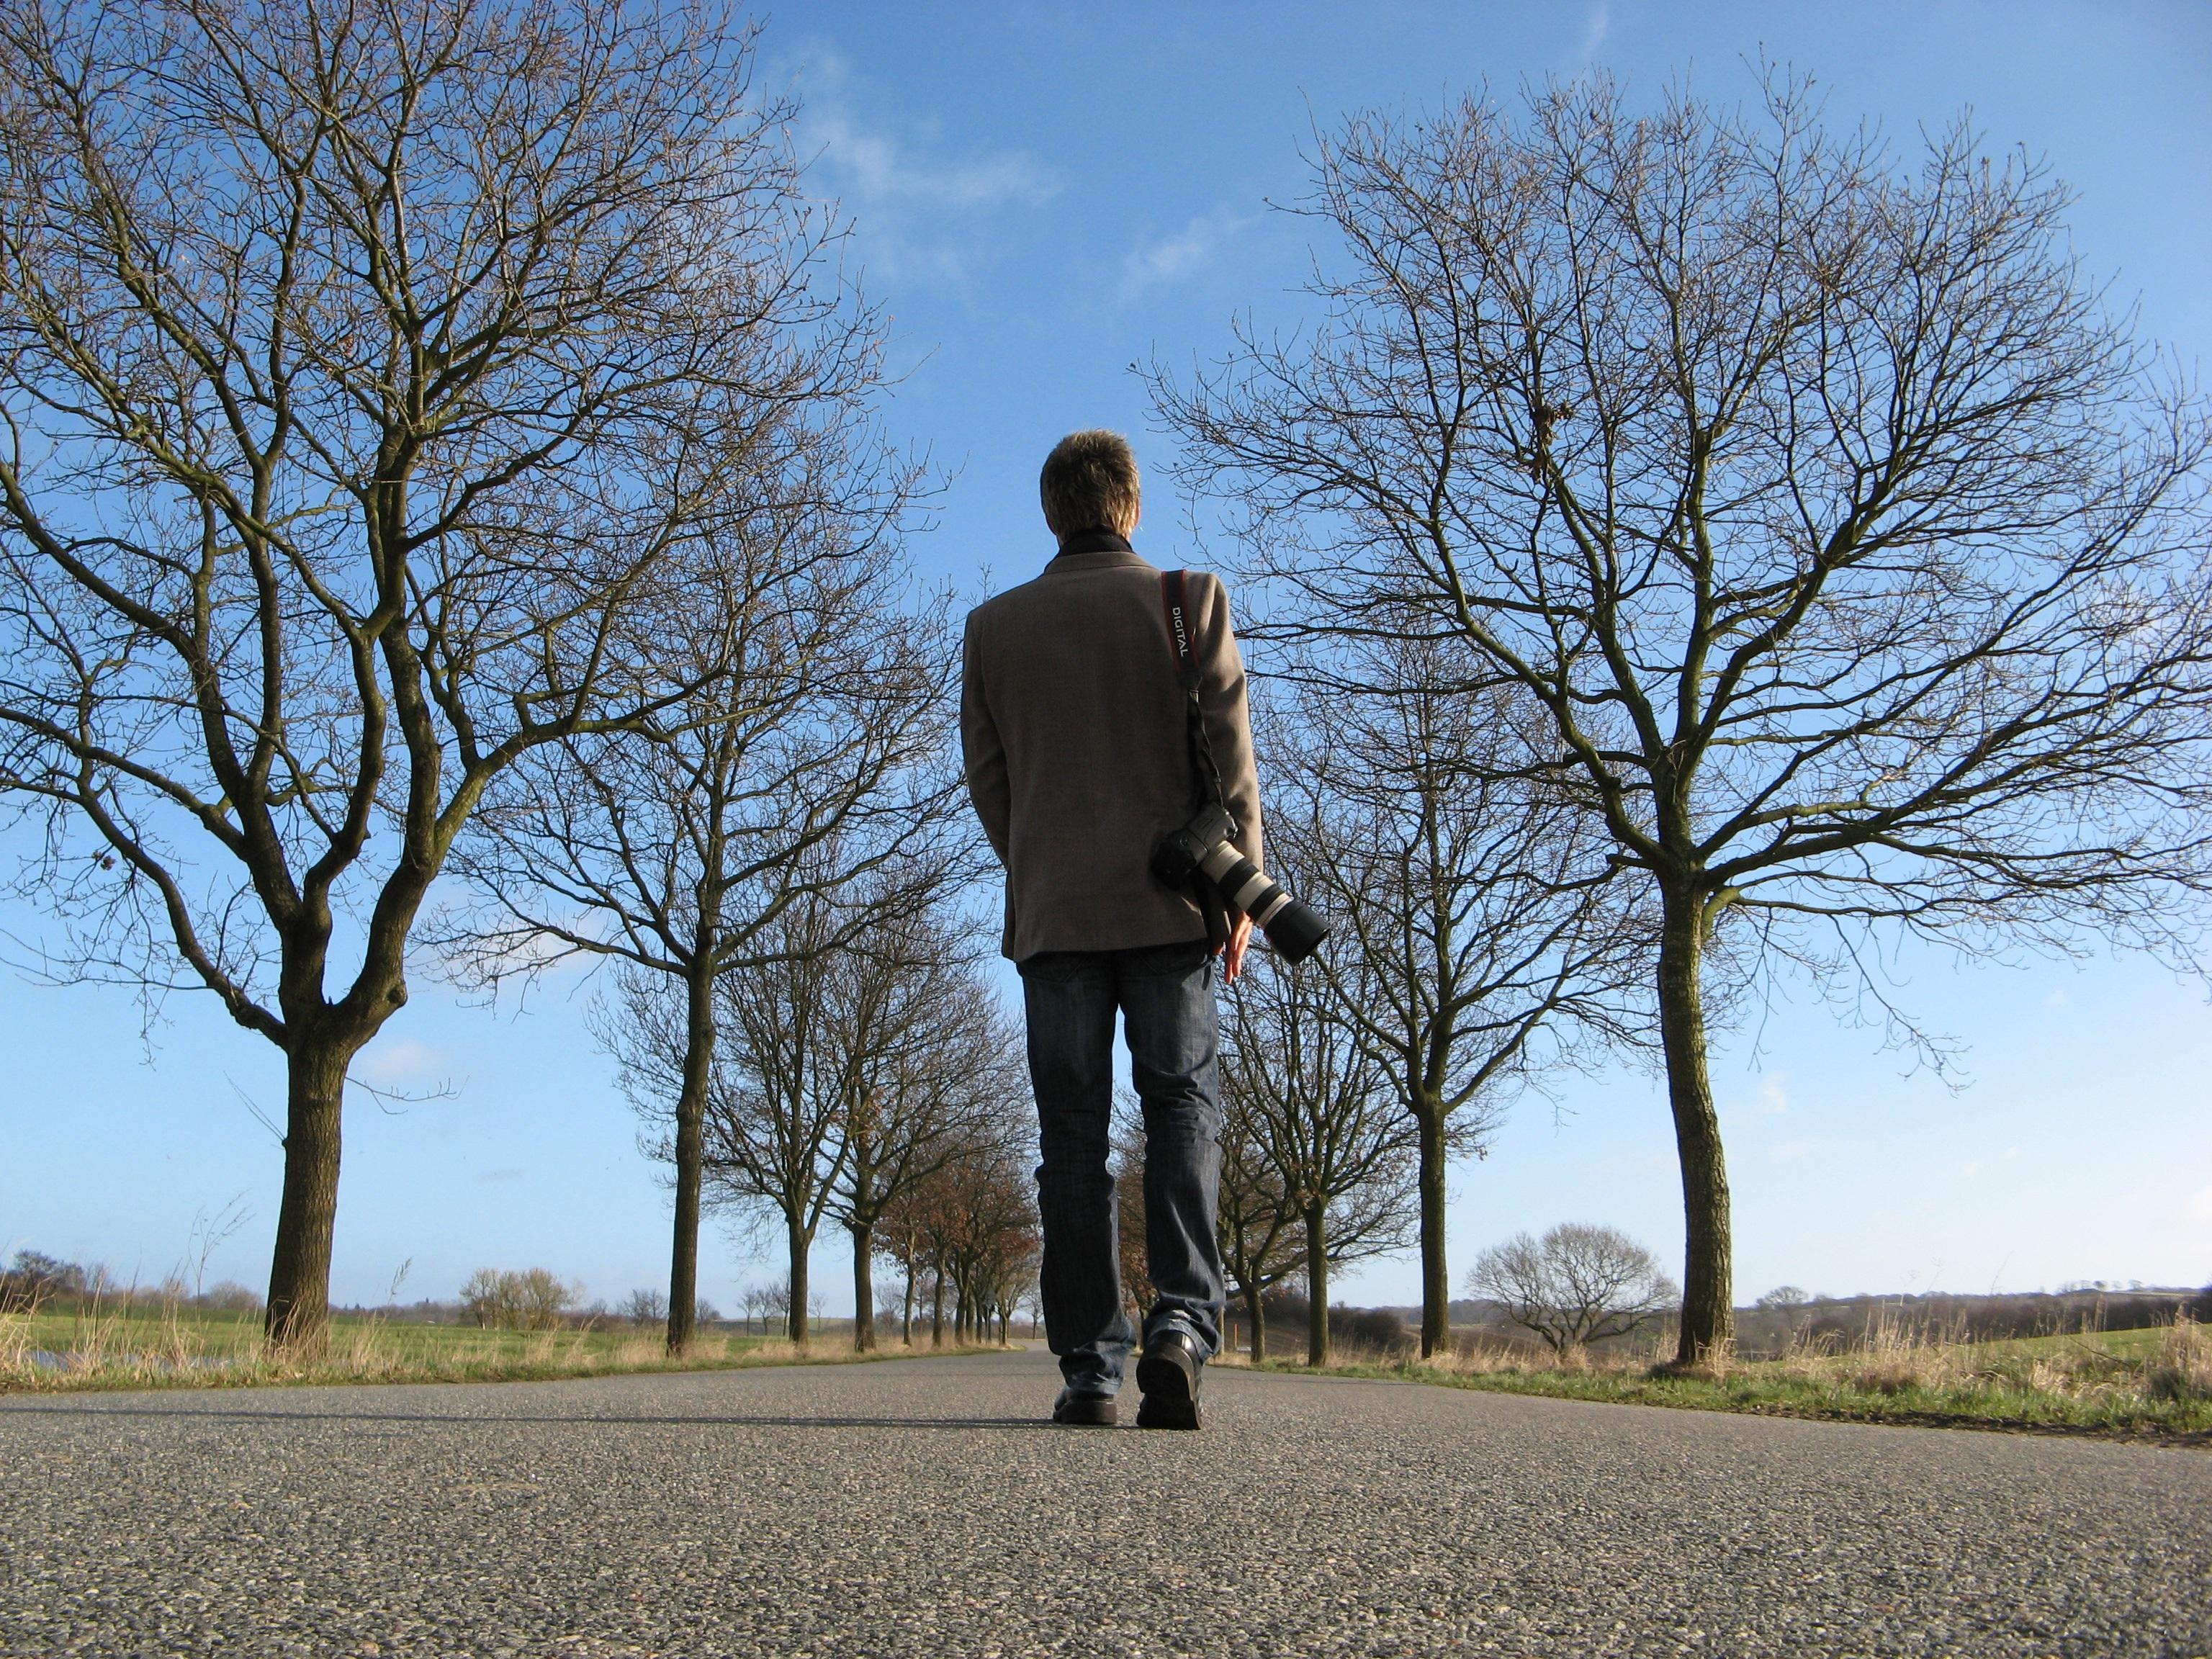 картинка человека который гуляет цель